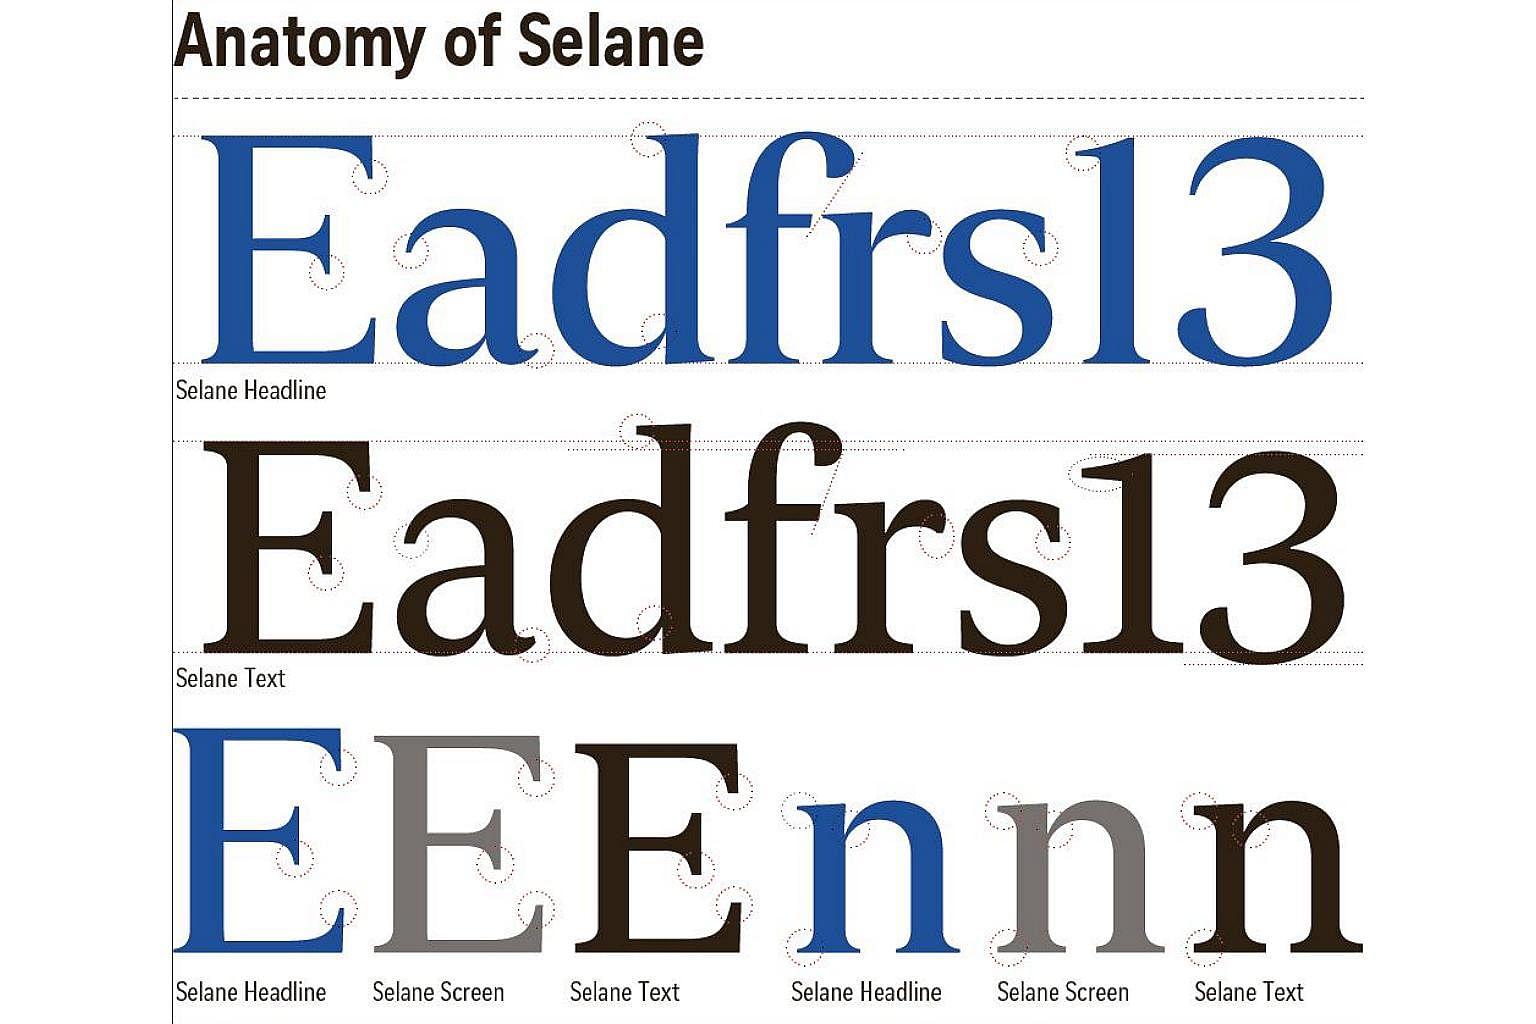 ST font wins design awards, Singapore News & Top Stories - The ...